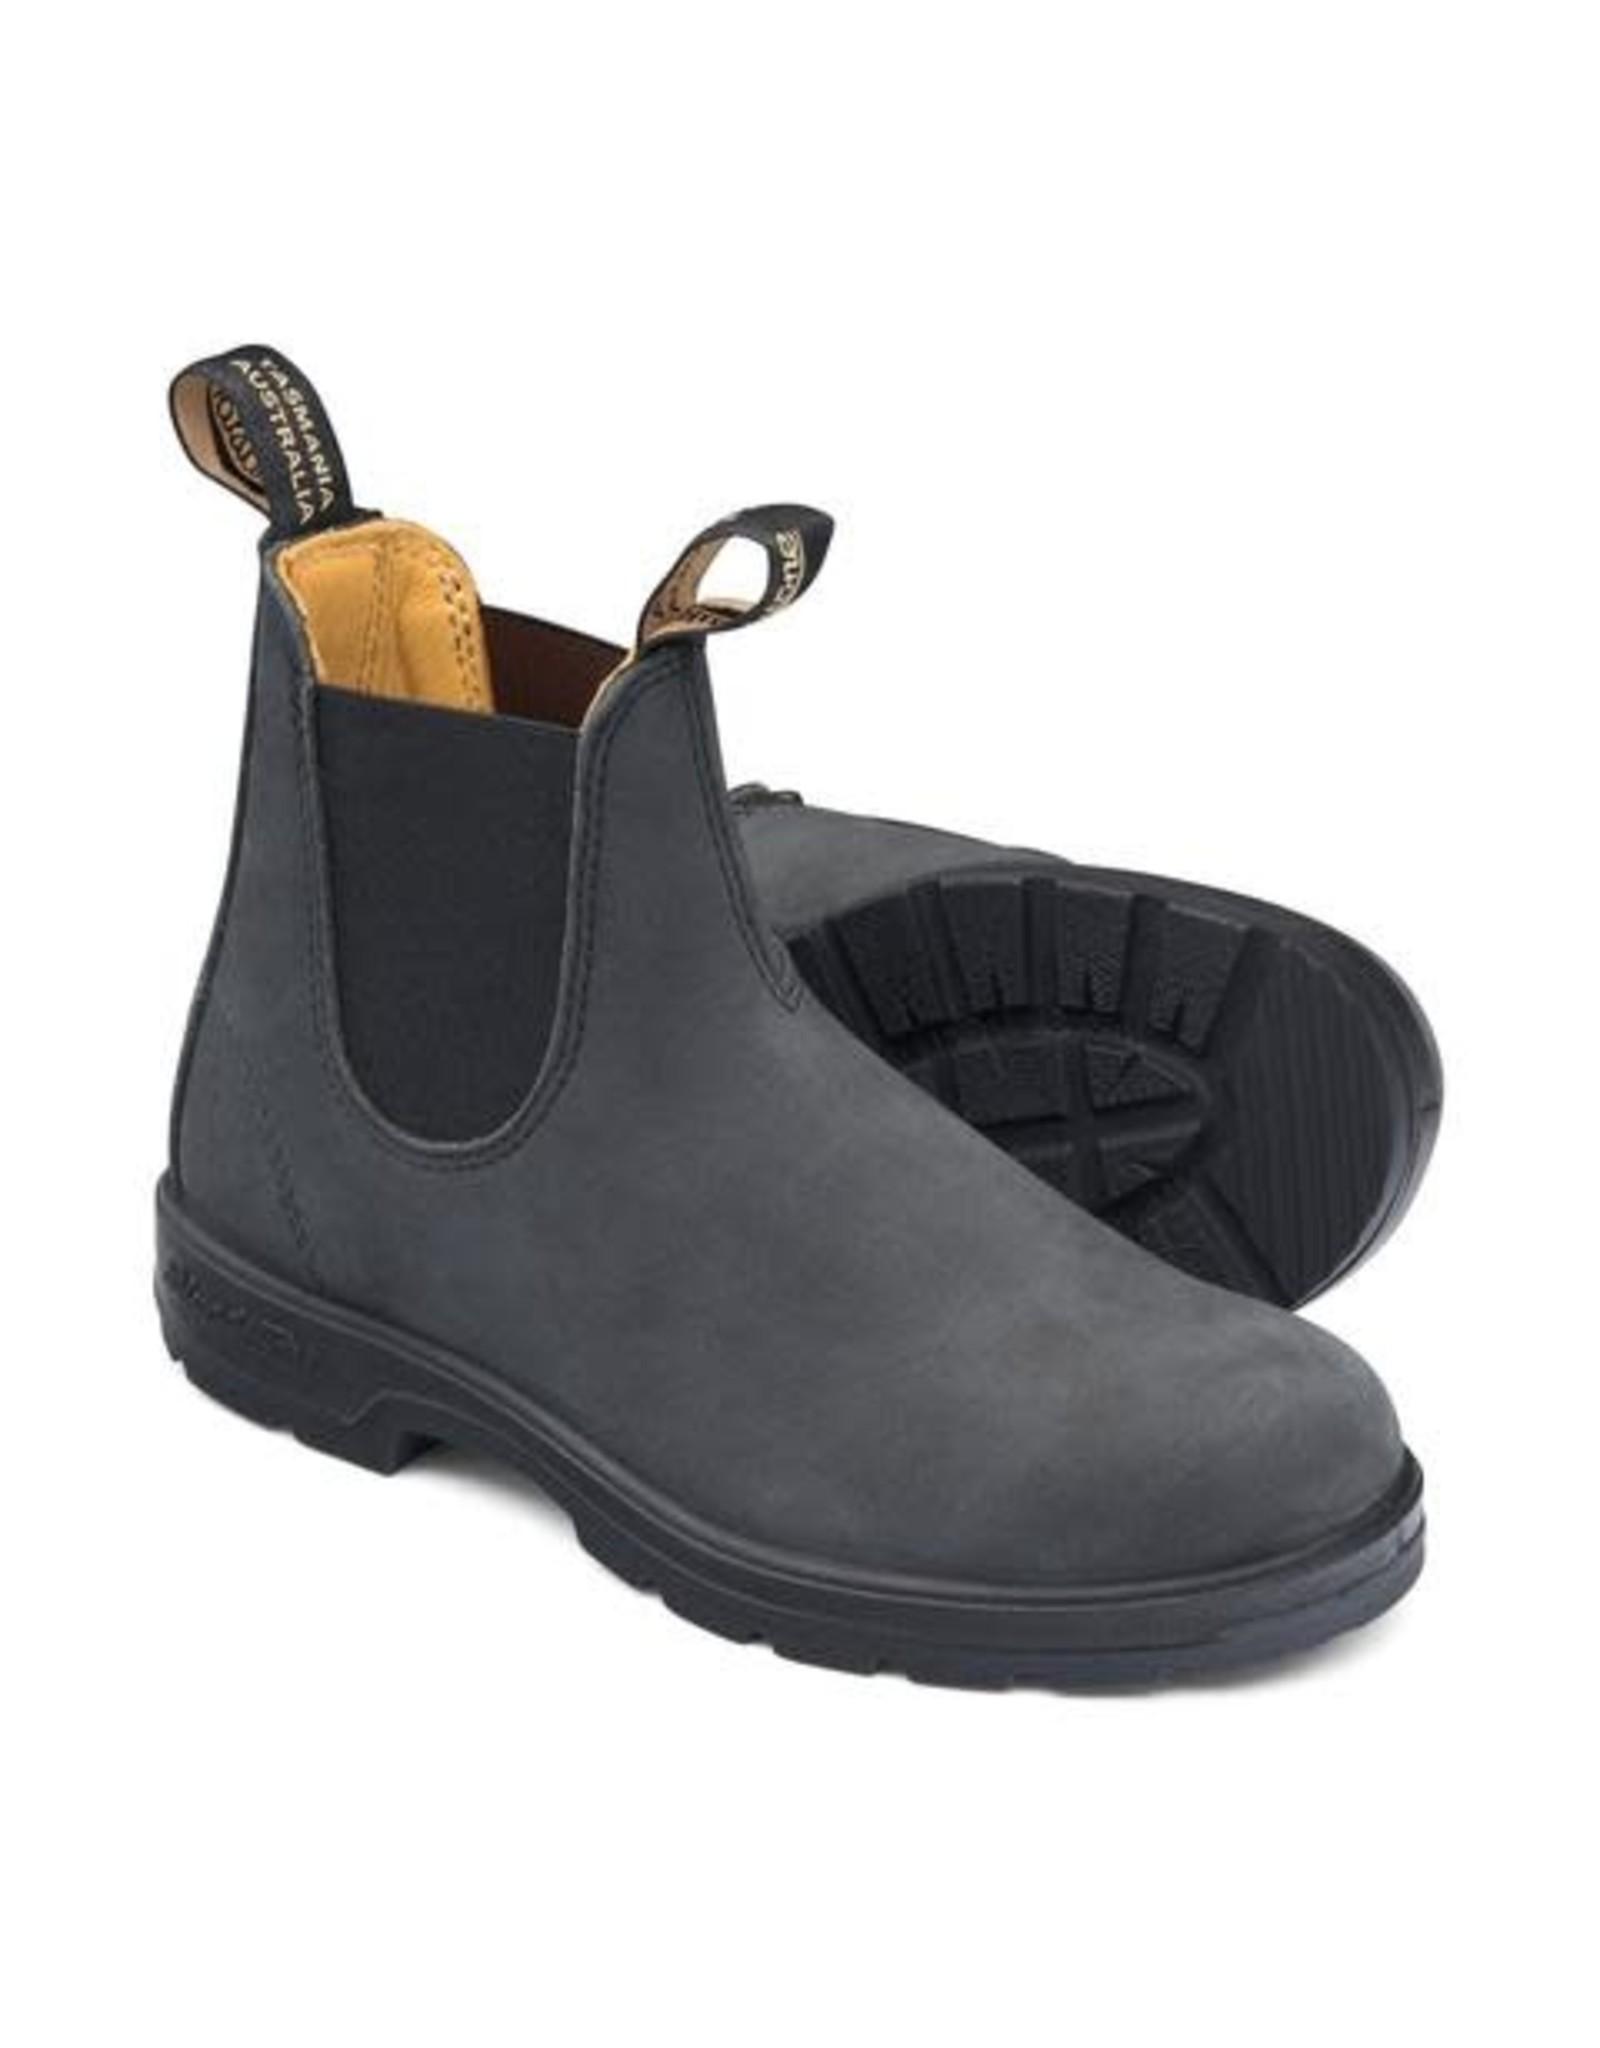 Blundstone Blundstone - Botte homme leather lined rustic black